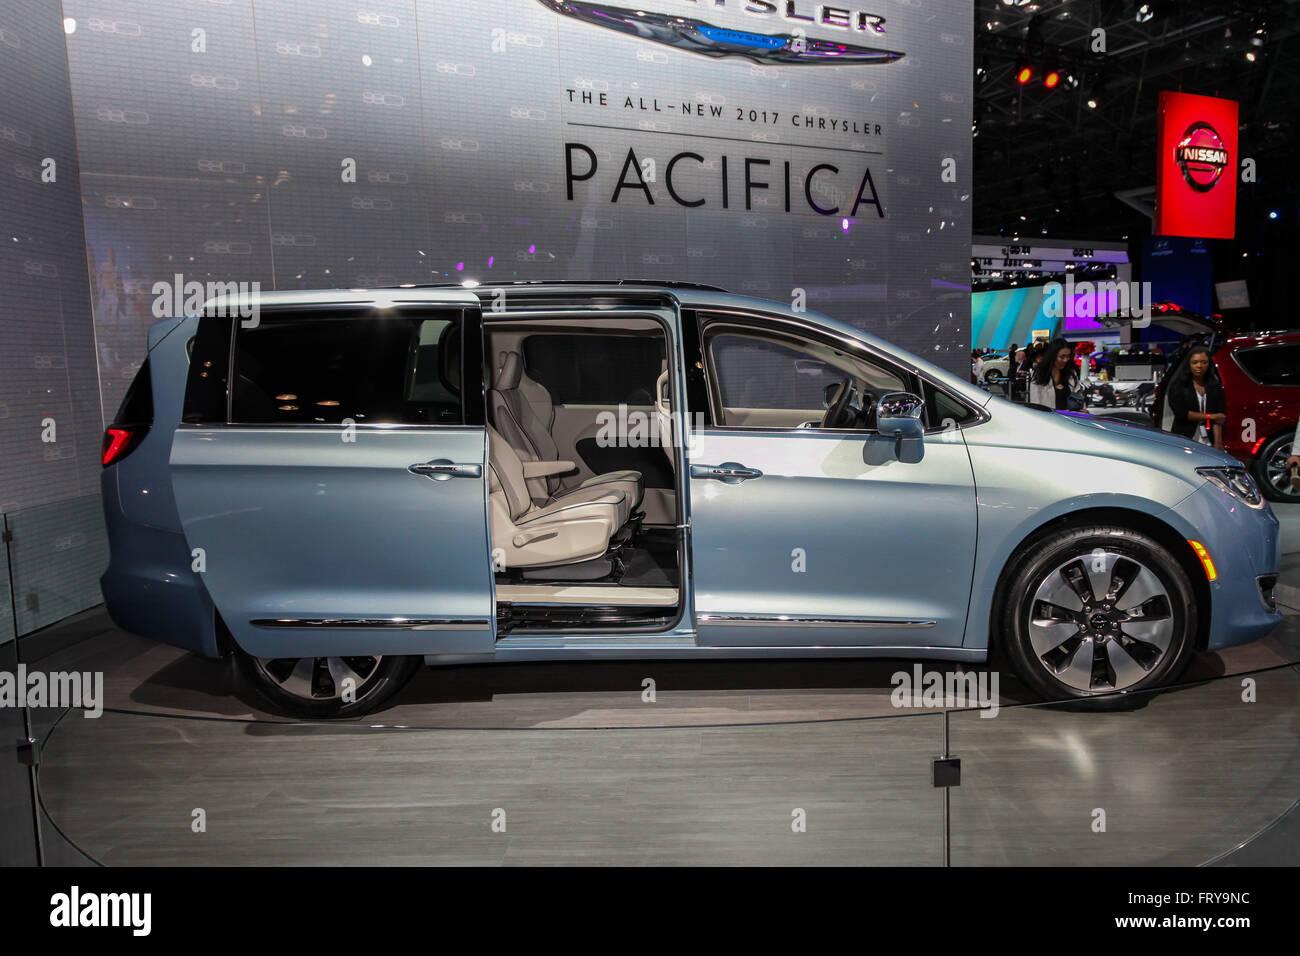 Chrysler Auto Automobile Car Stockfotos & Chrysler Auto Automobile ...